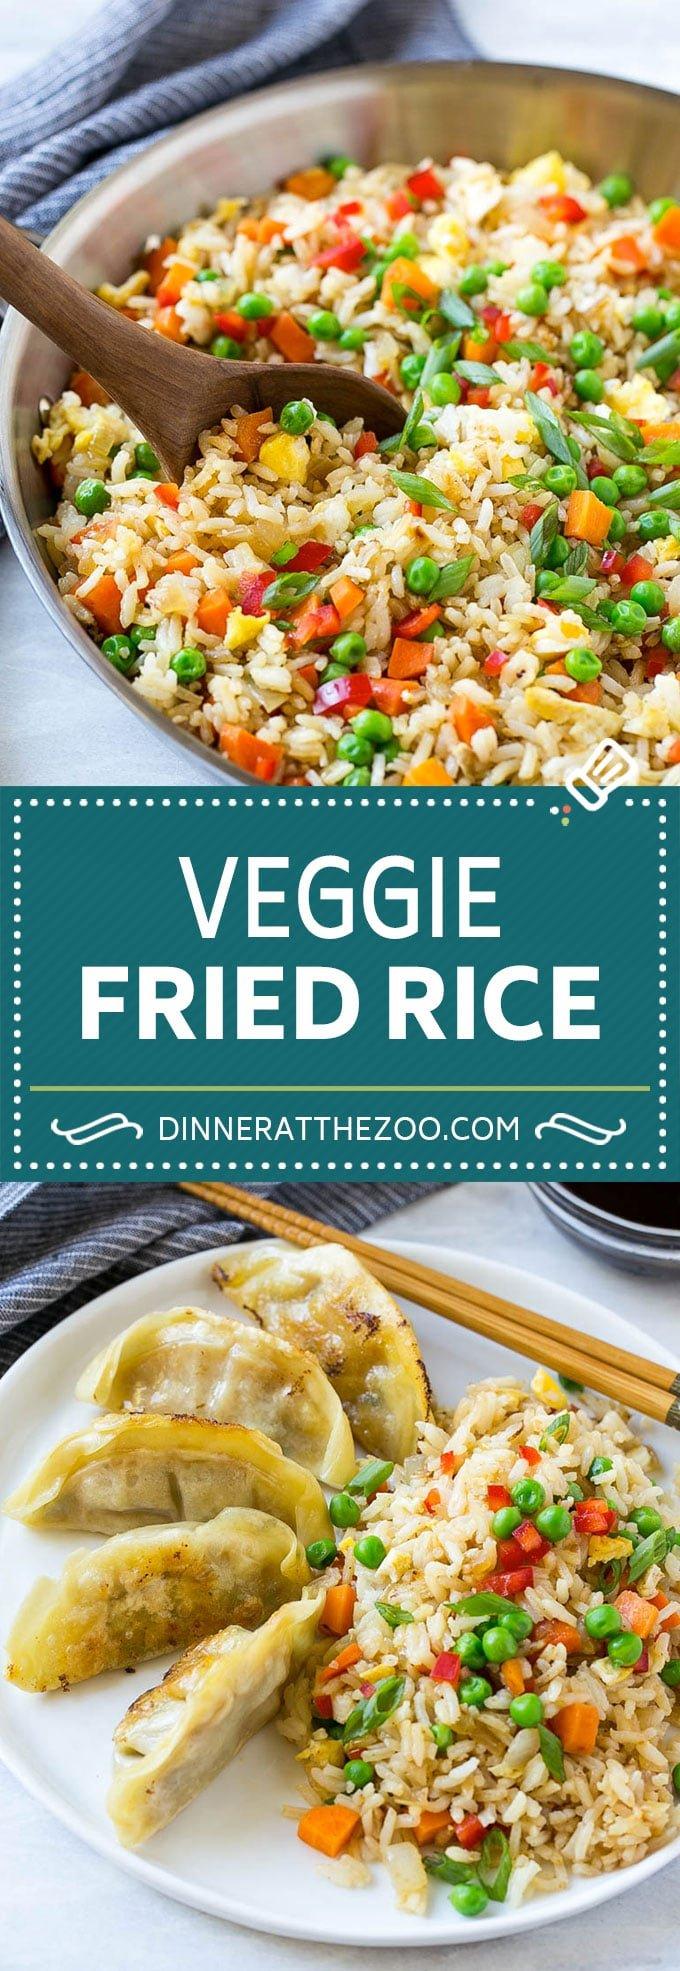 Veggie Fried Rice Recipe | Vegetarian Fried Rice #rice #friedrice #vegetarian #dinner #dinneratthezoo #sidedish